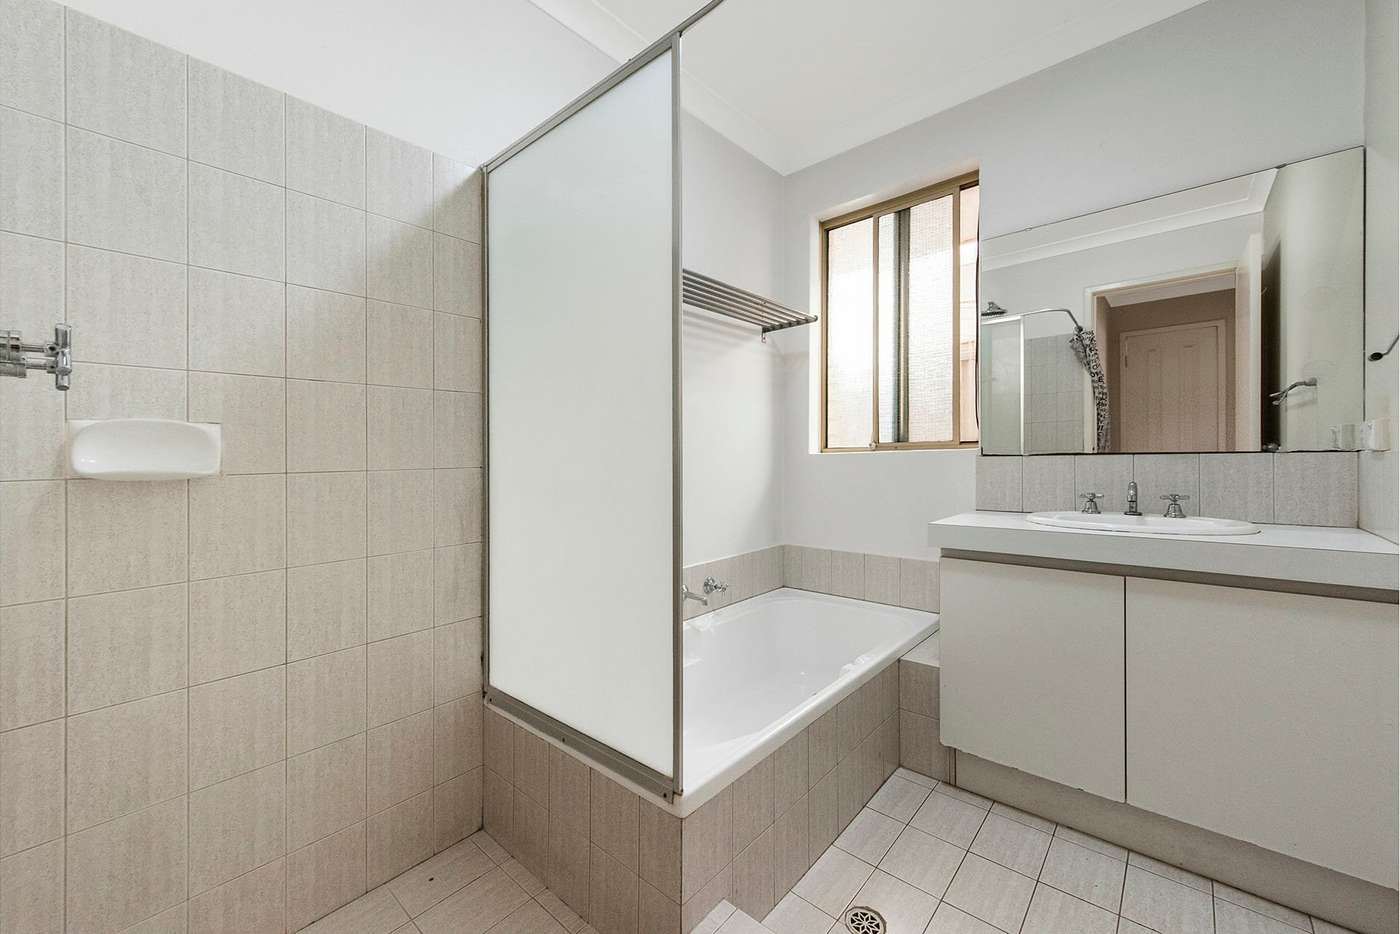 Sixth view of Homely villa listing, Villa 3/15 Egham Street, Burswood WA 6100